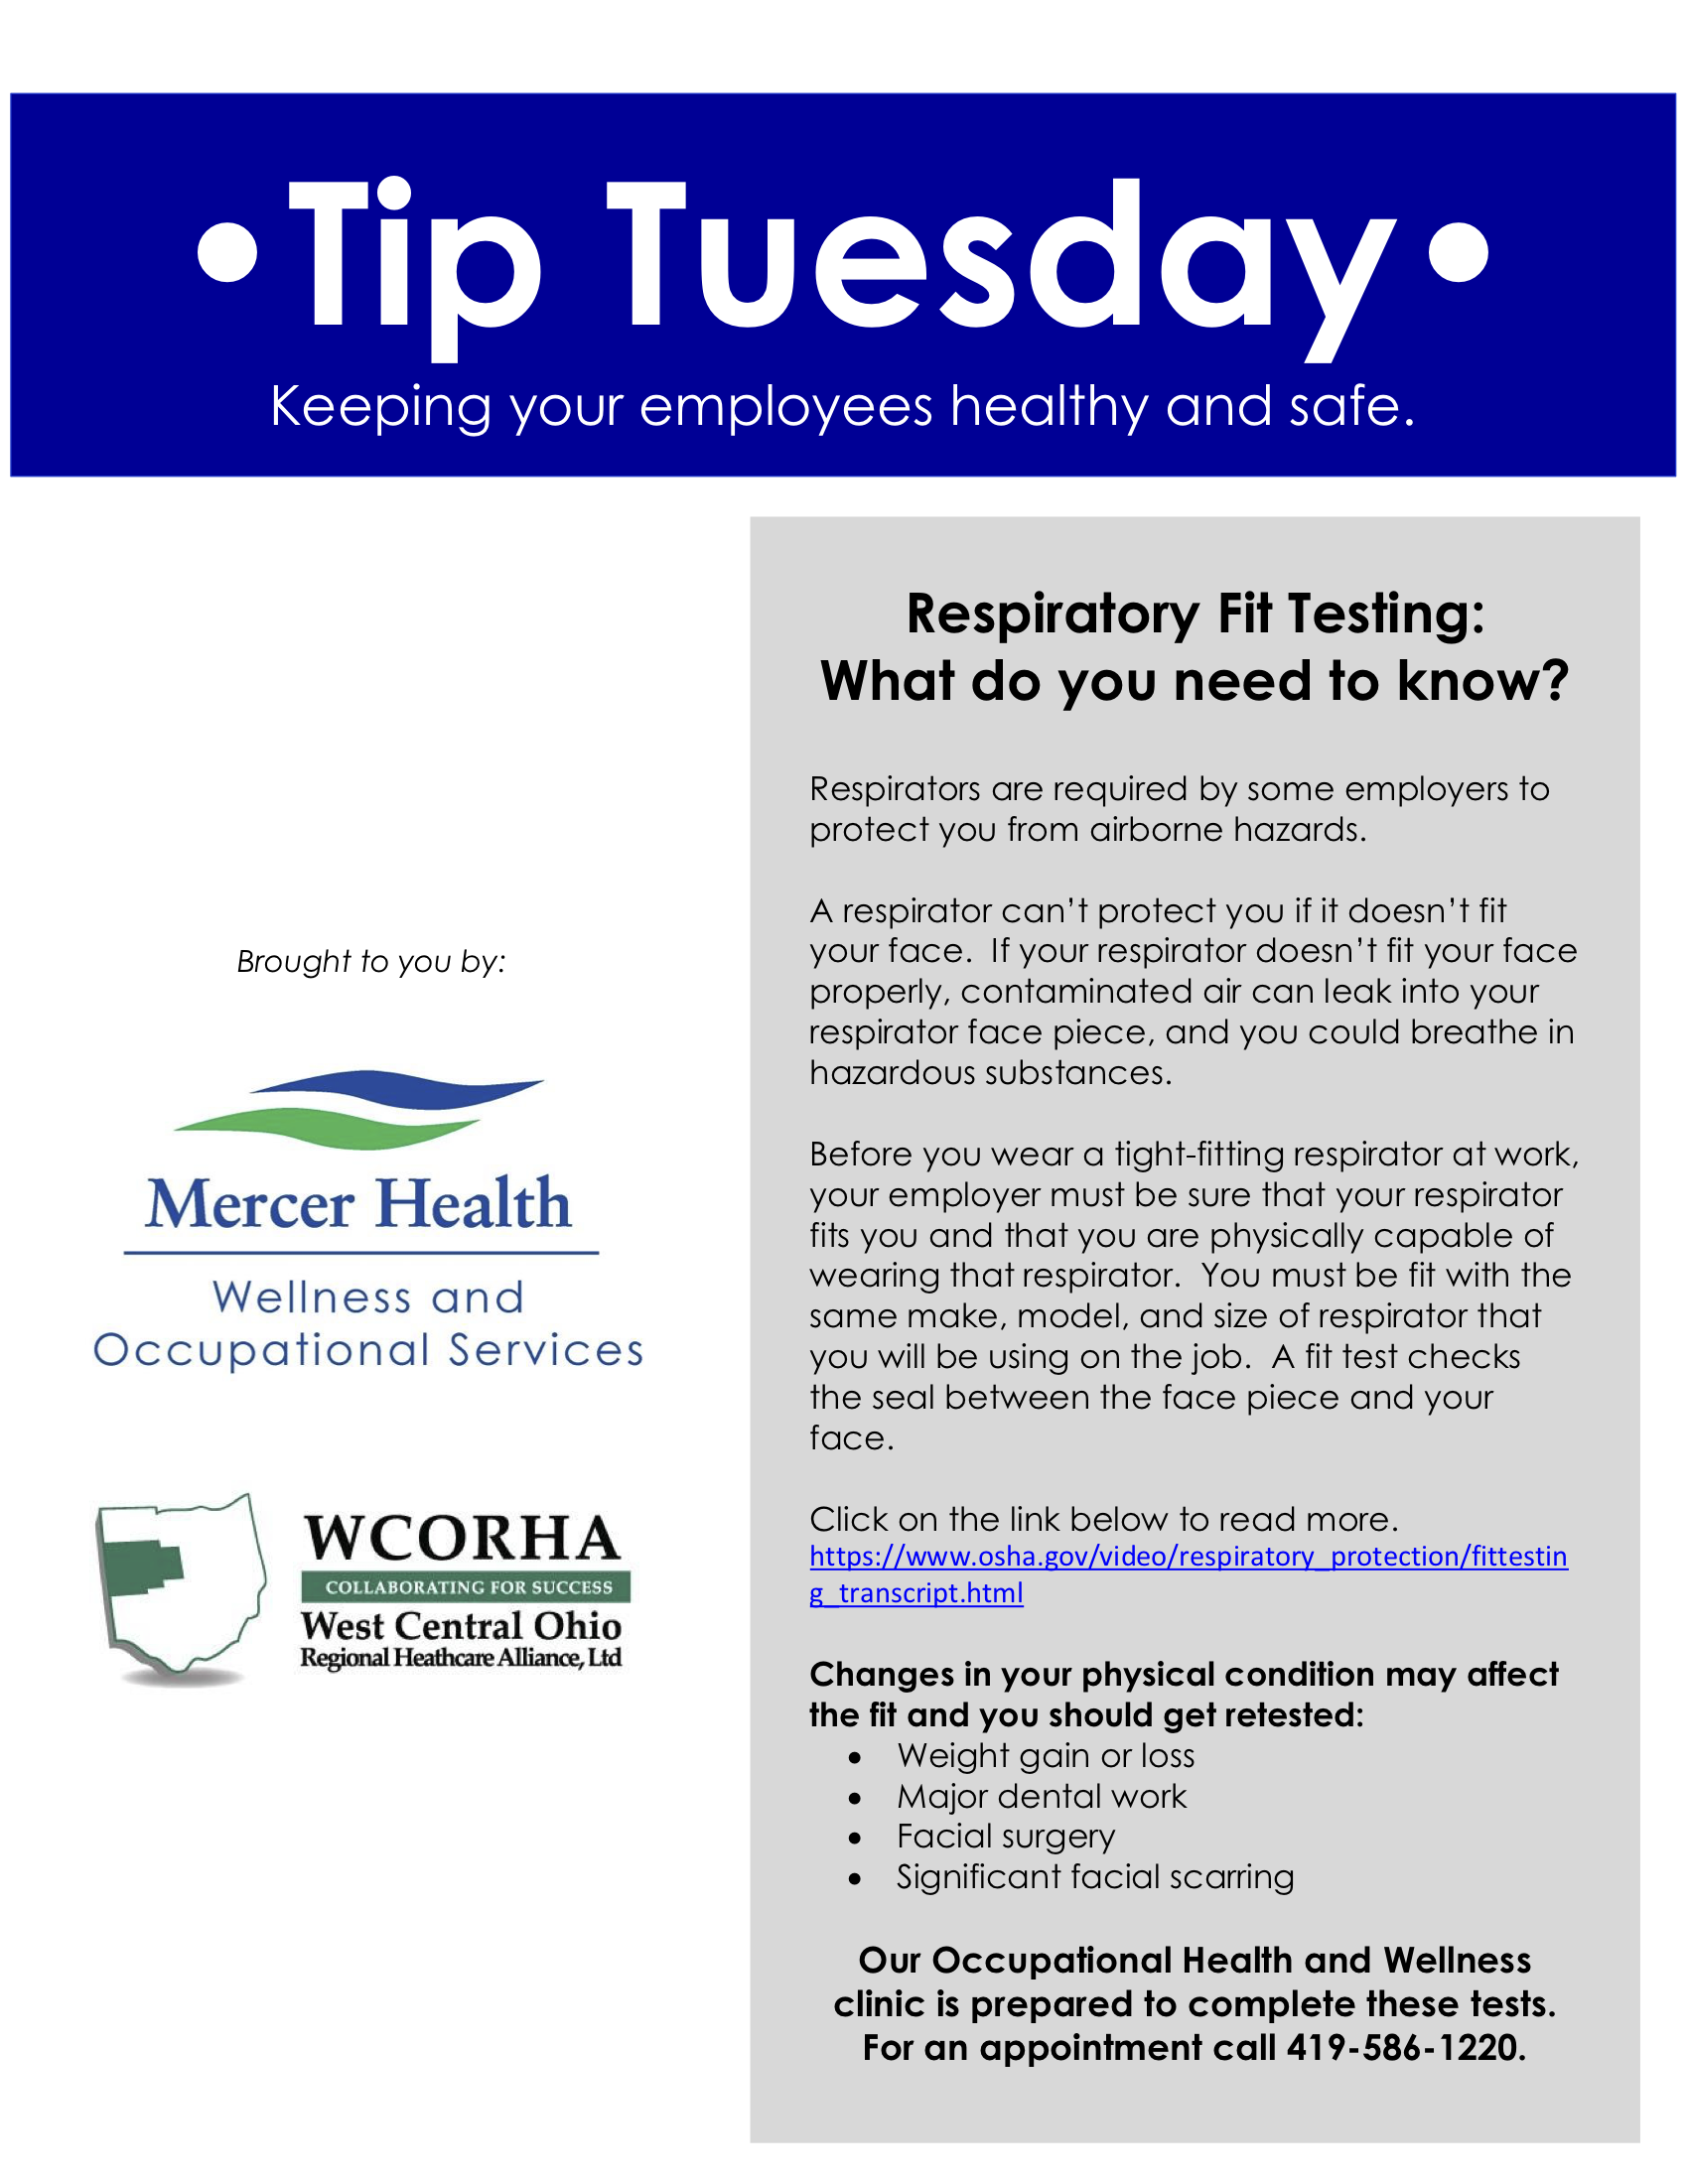 Respiratory Fit Testing Workplace Wellness Occupational Health Respiratory